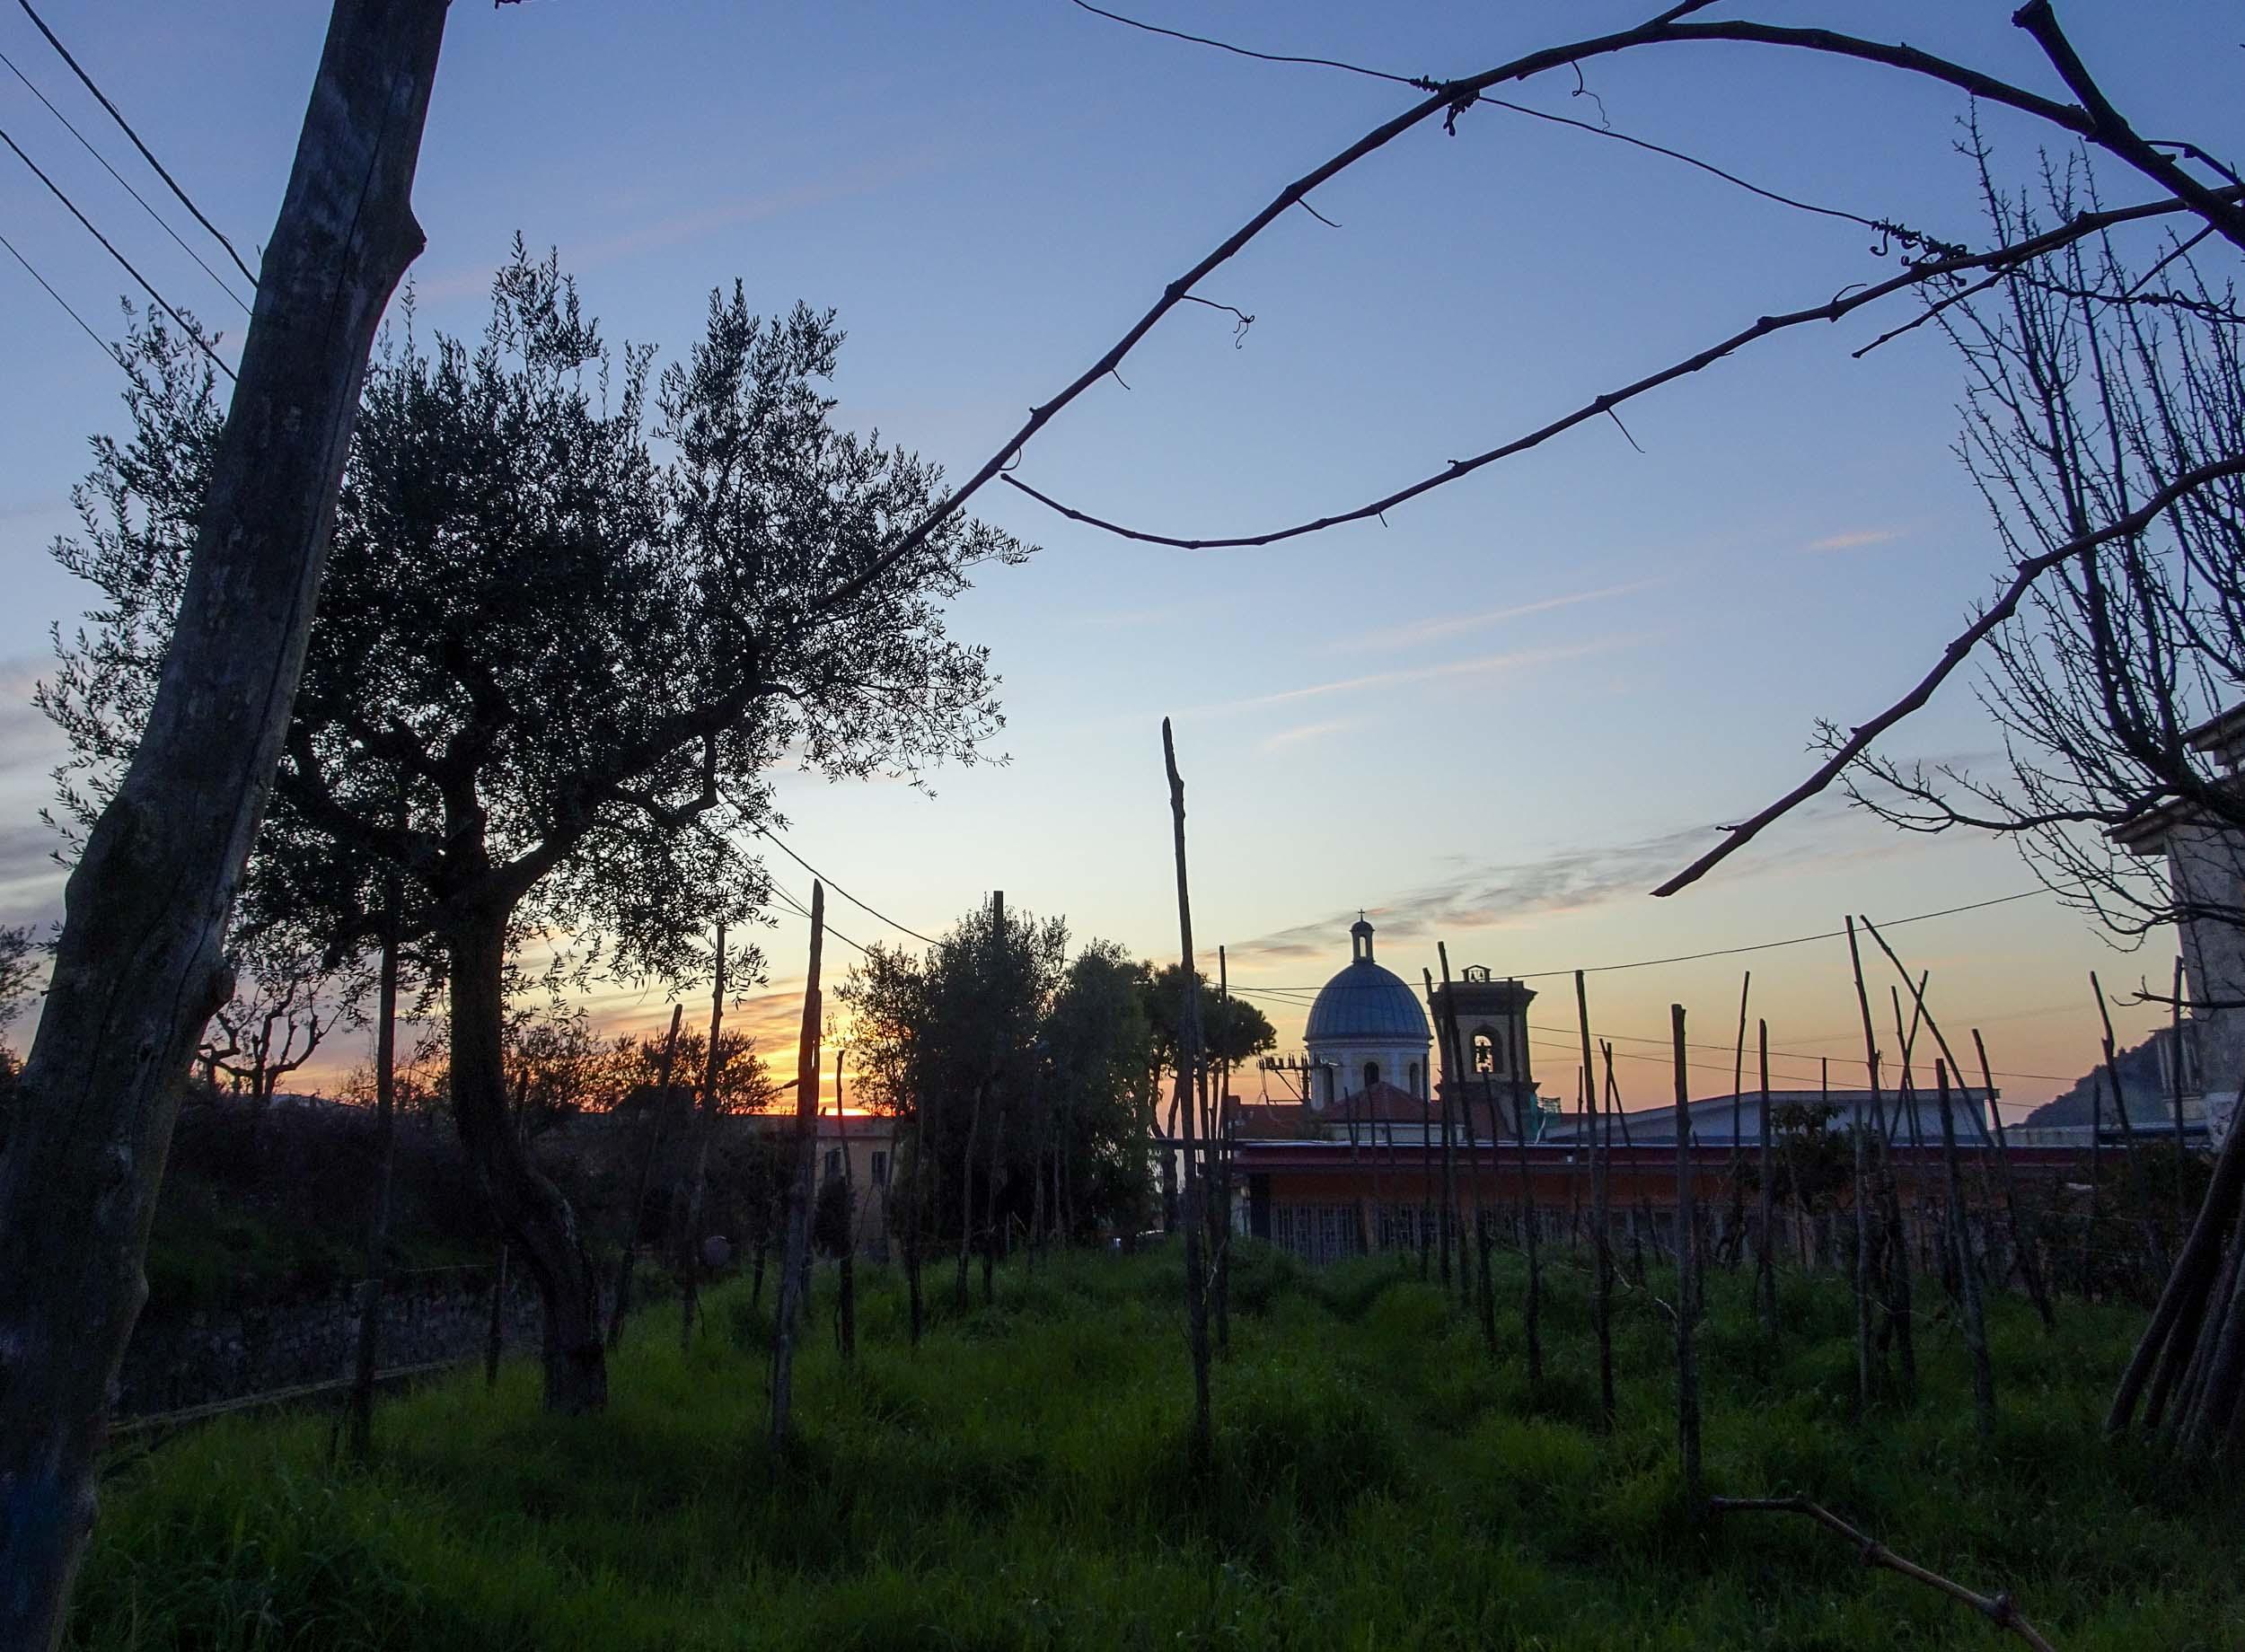 Watching sunset beyond the vineyard at Antonio's Airbnb in Arola, Italy